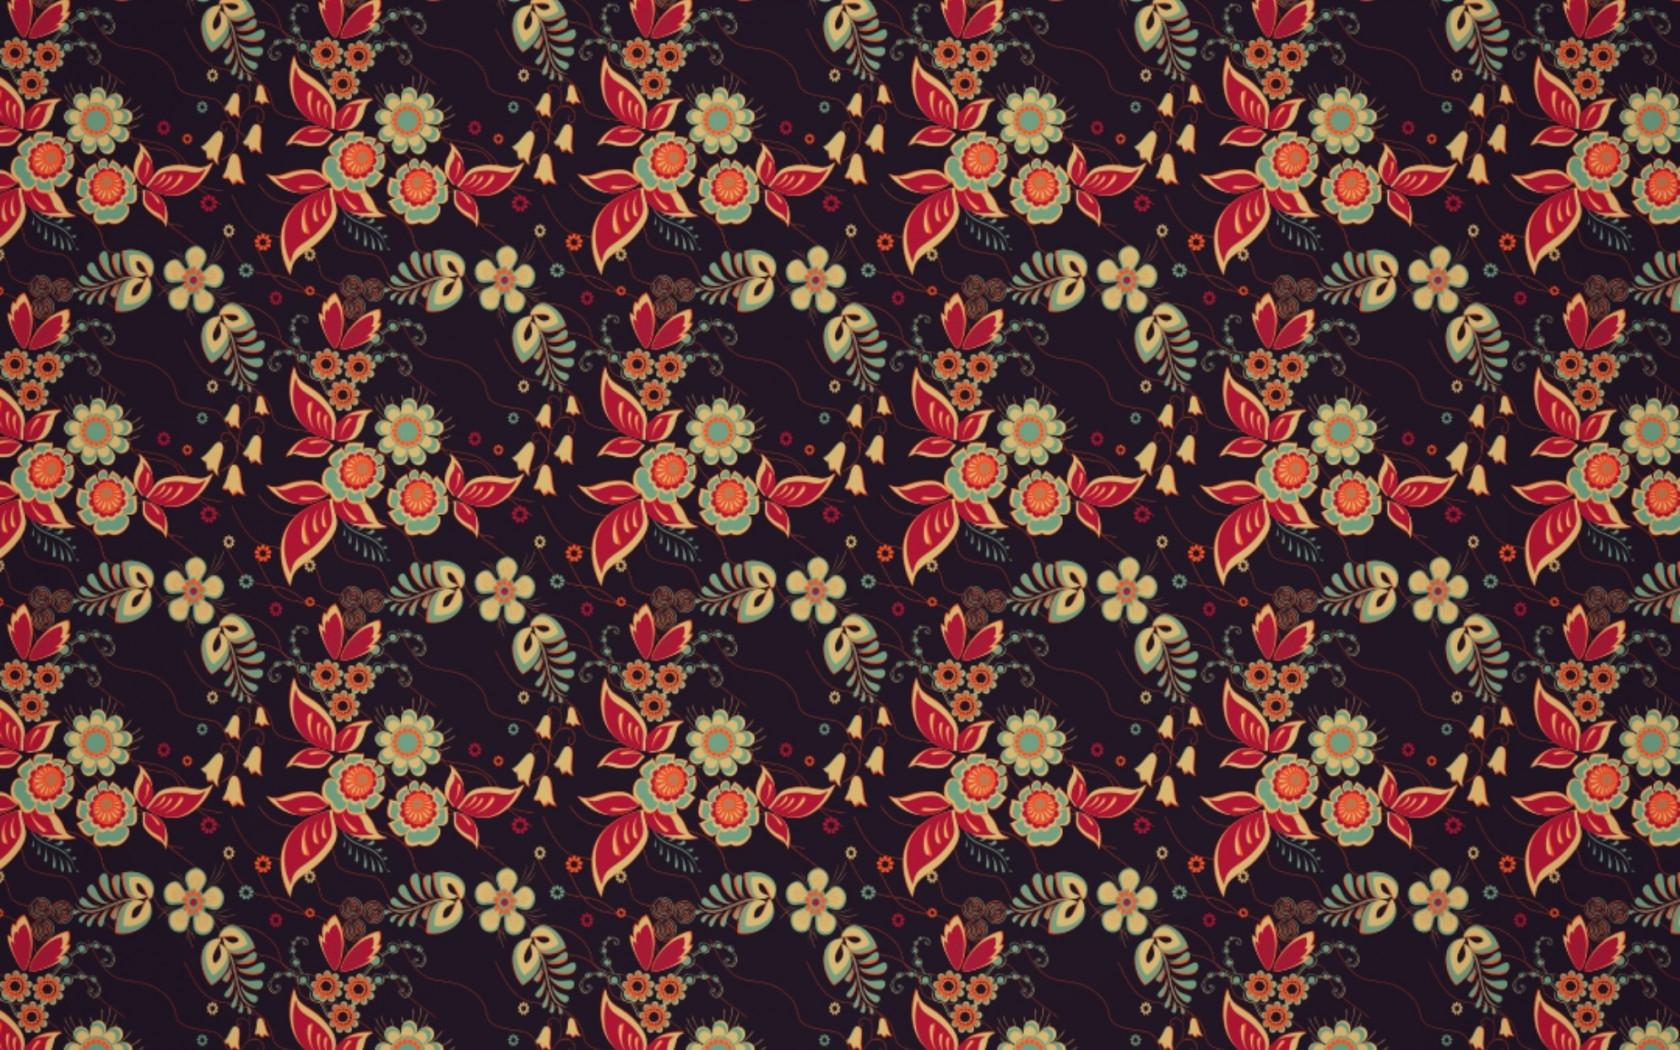 Black Red Pattern Texture Carpet Tile ART Color Flower Design Wallpaper Textile Flooring